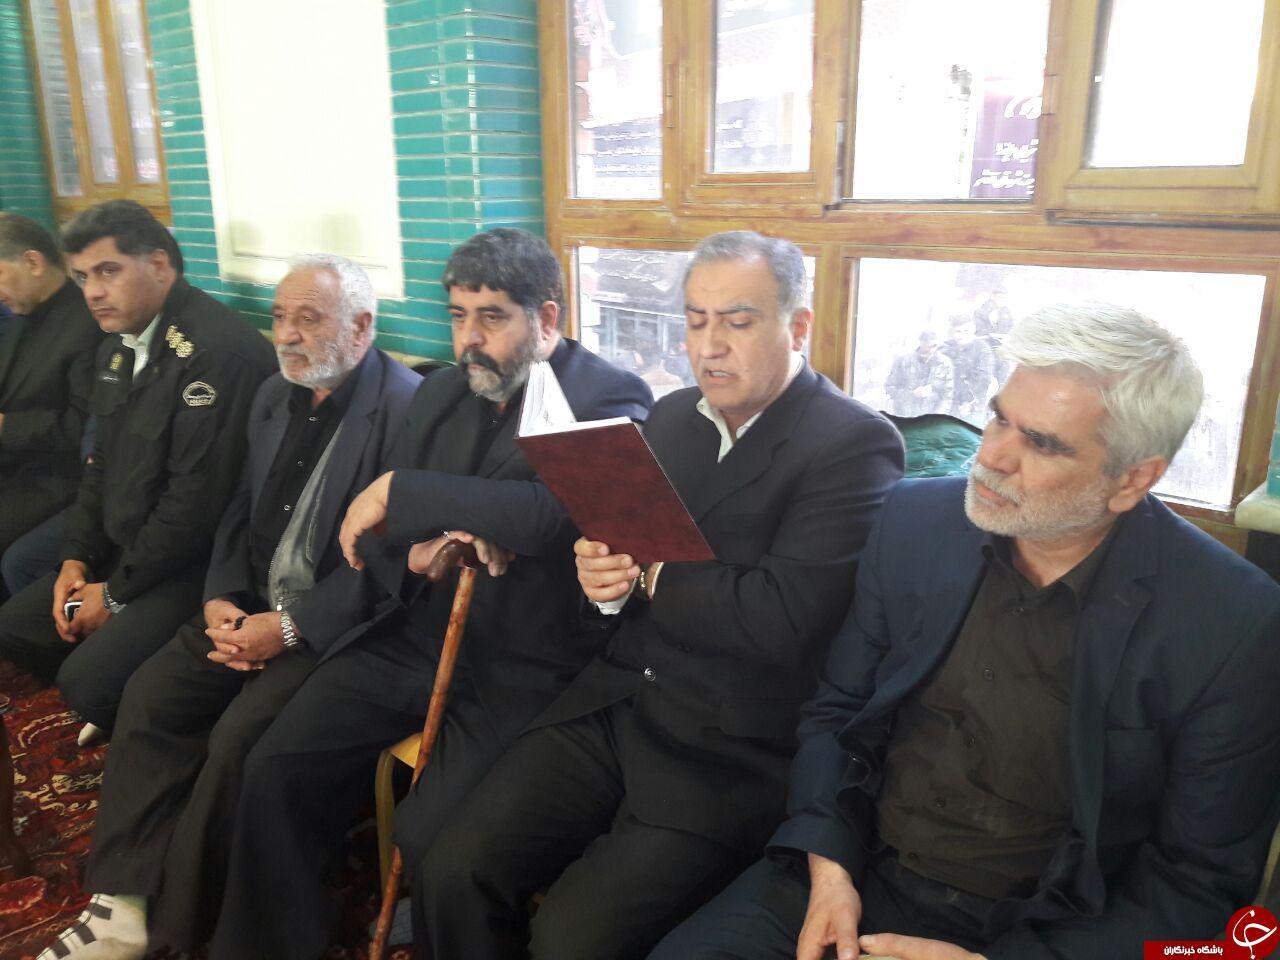 برگزاری مراسم گرامی داشت جان باختگان سیل آذرشهر